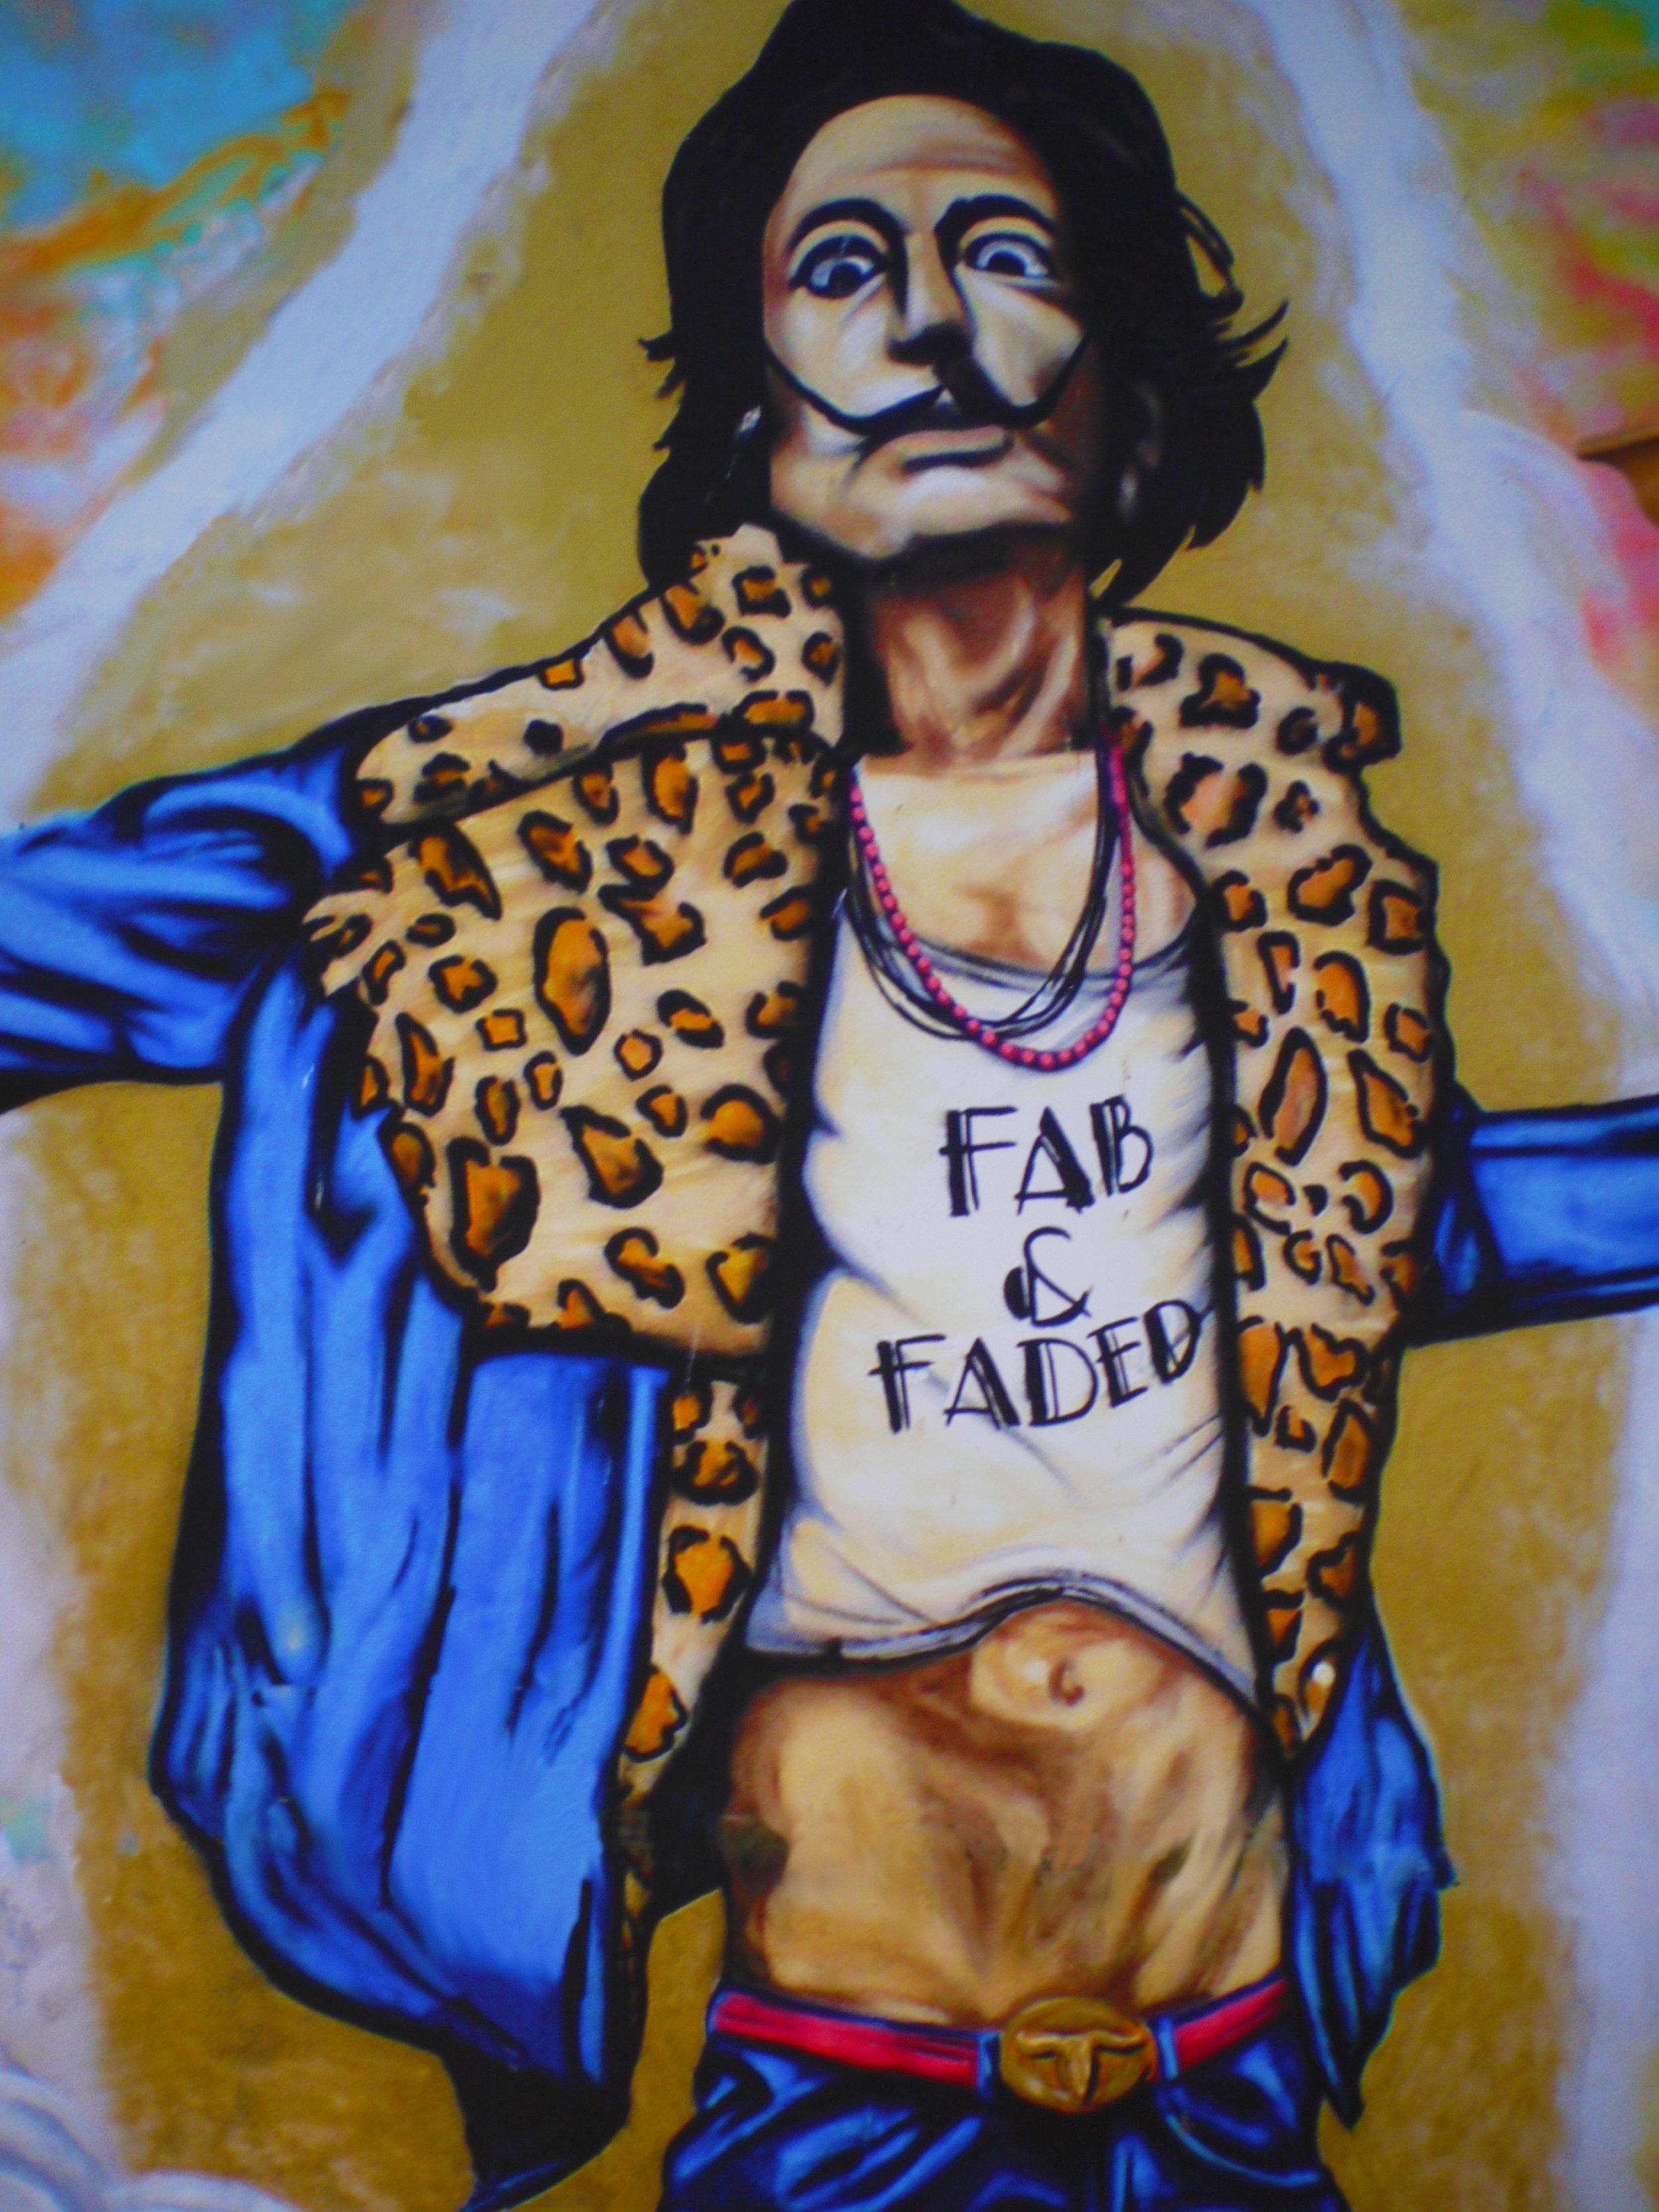 f&f man painting.JPG